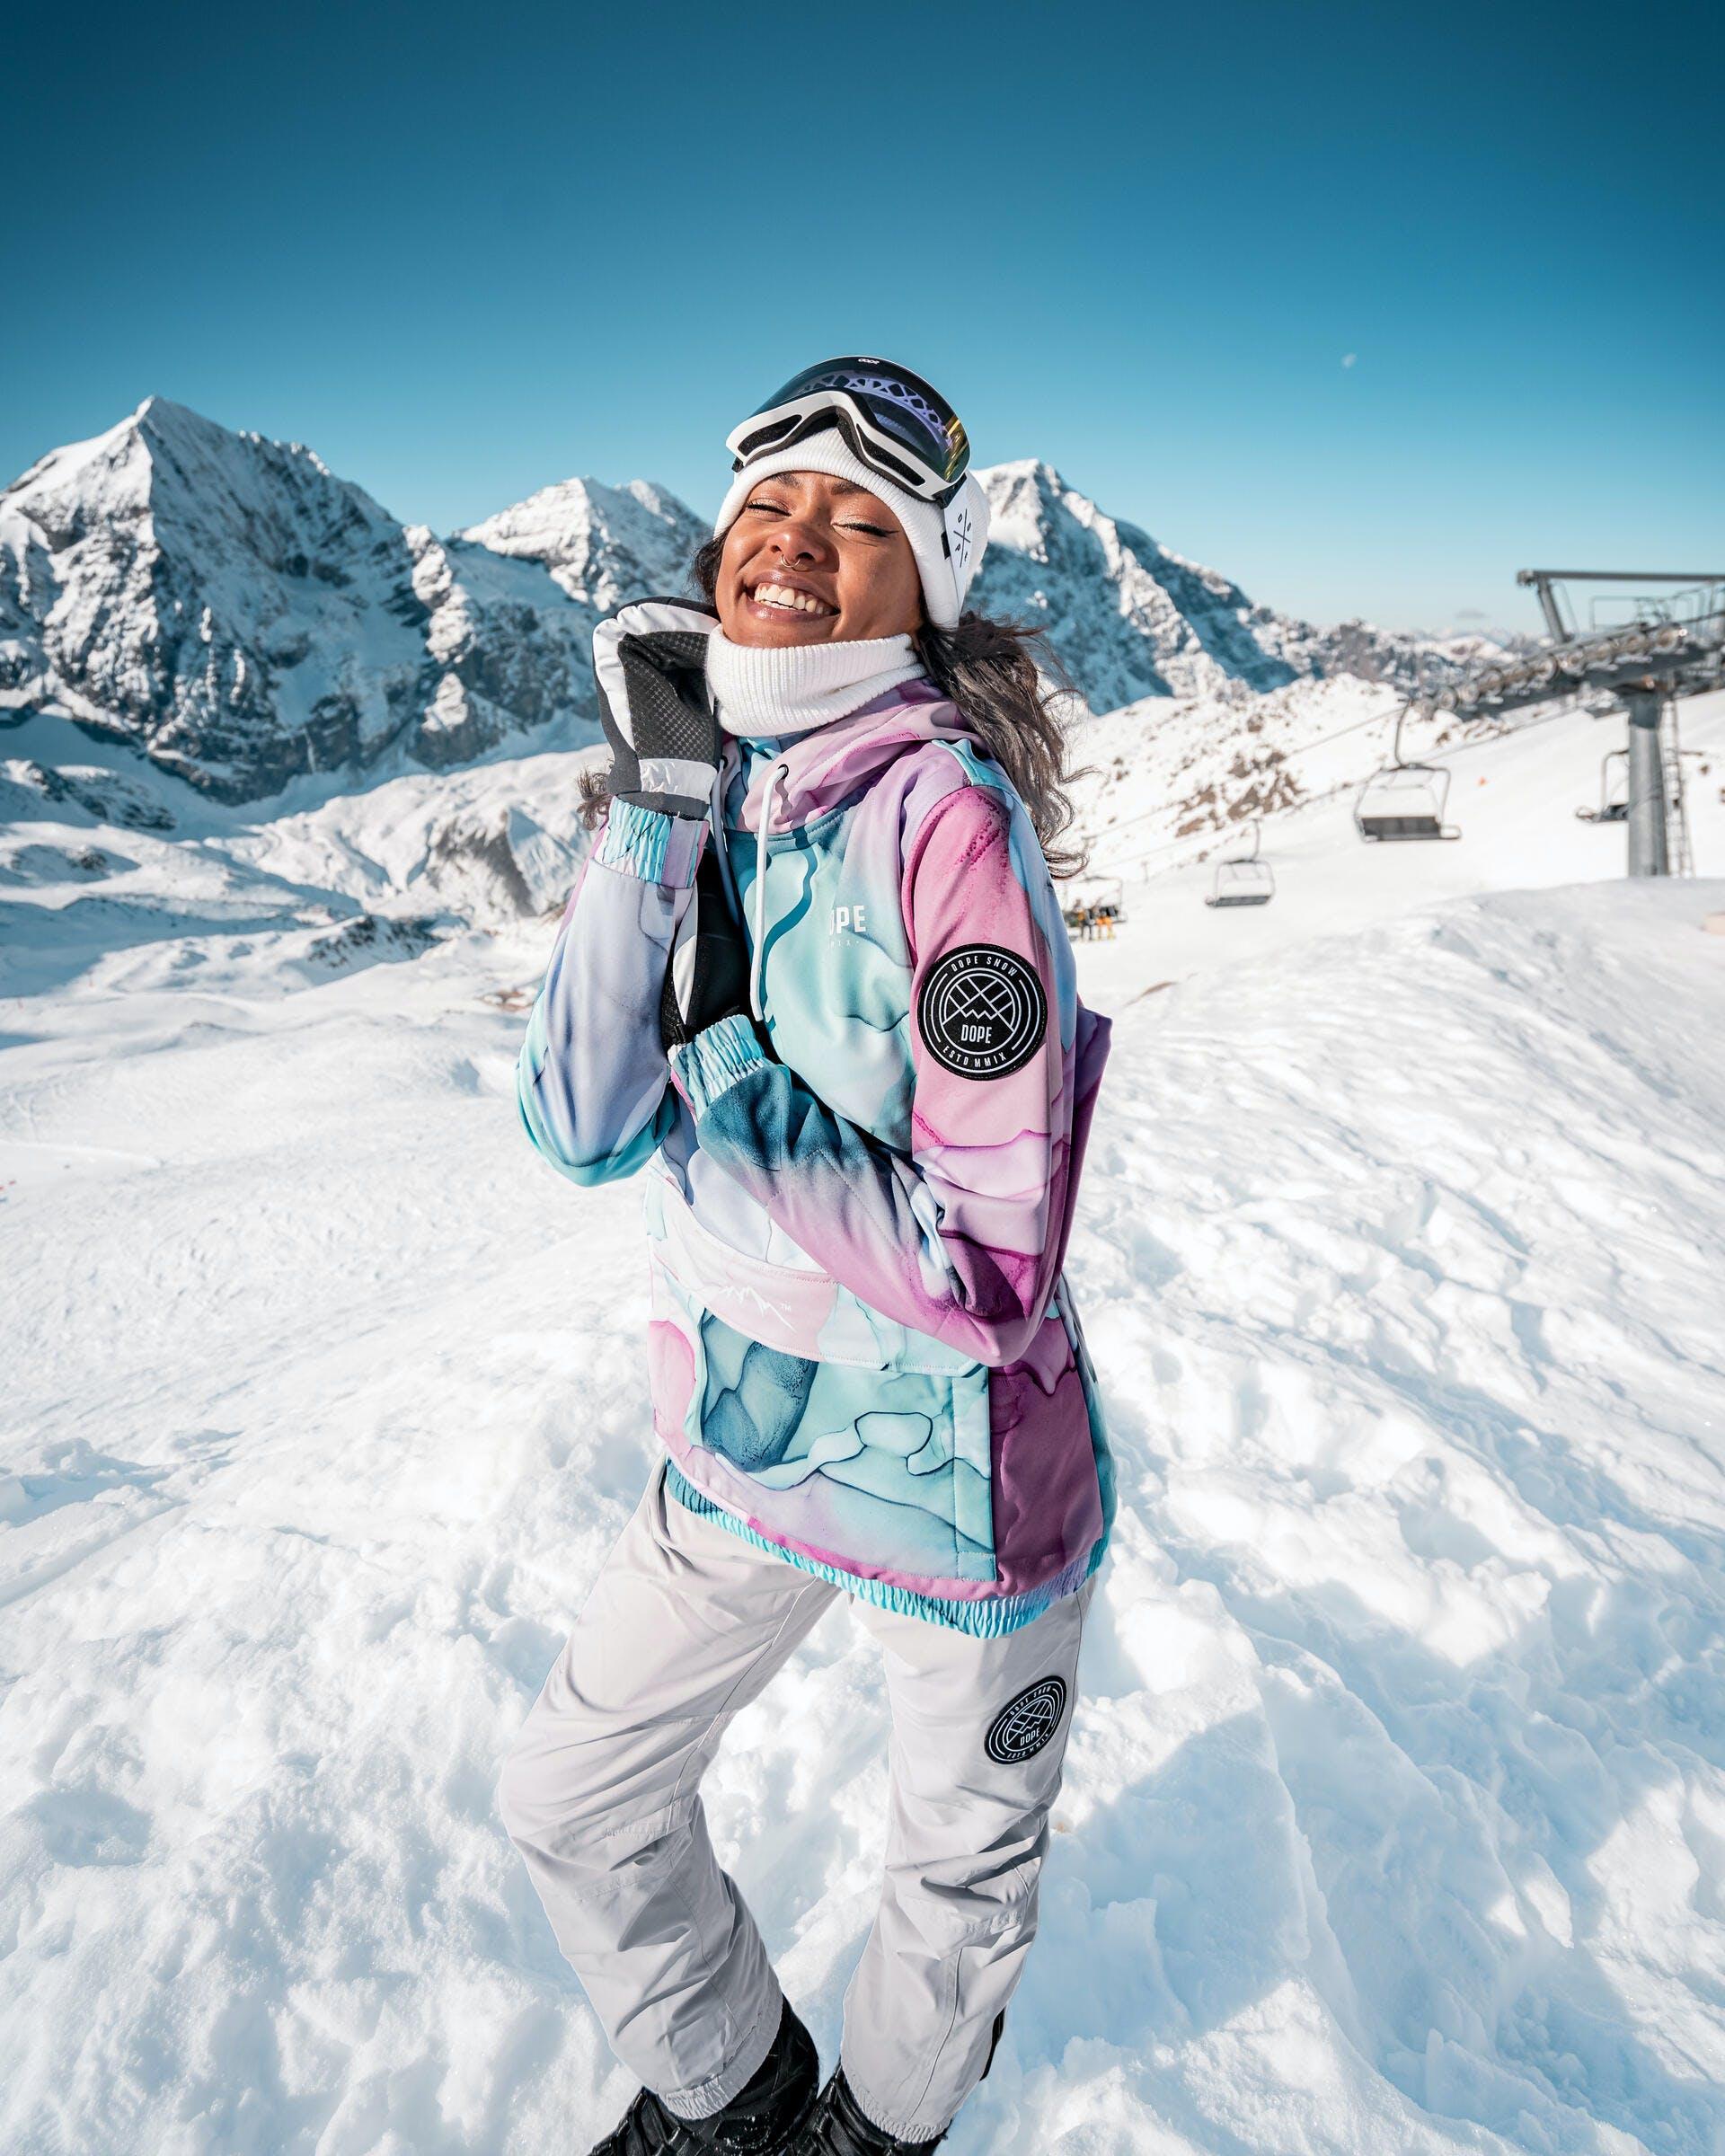 Skiing in April: insider secrets